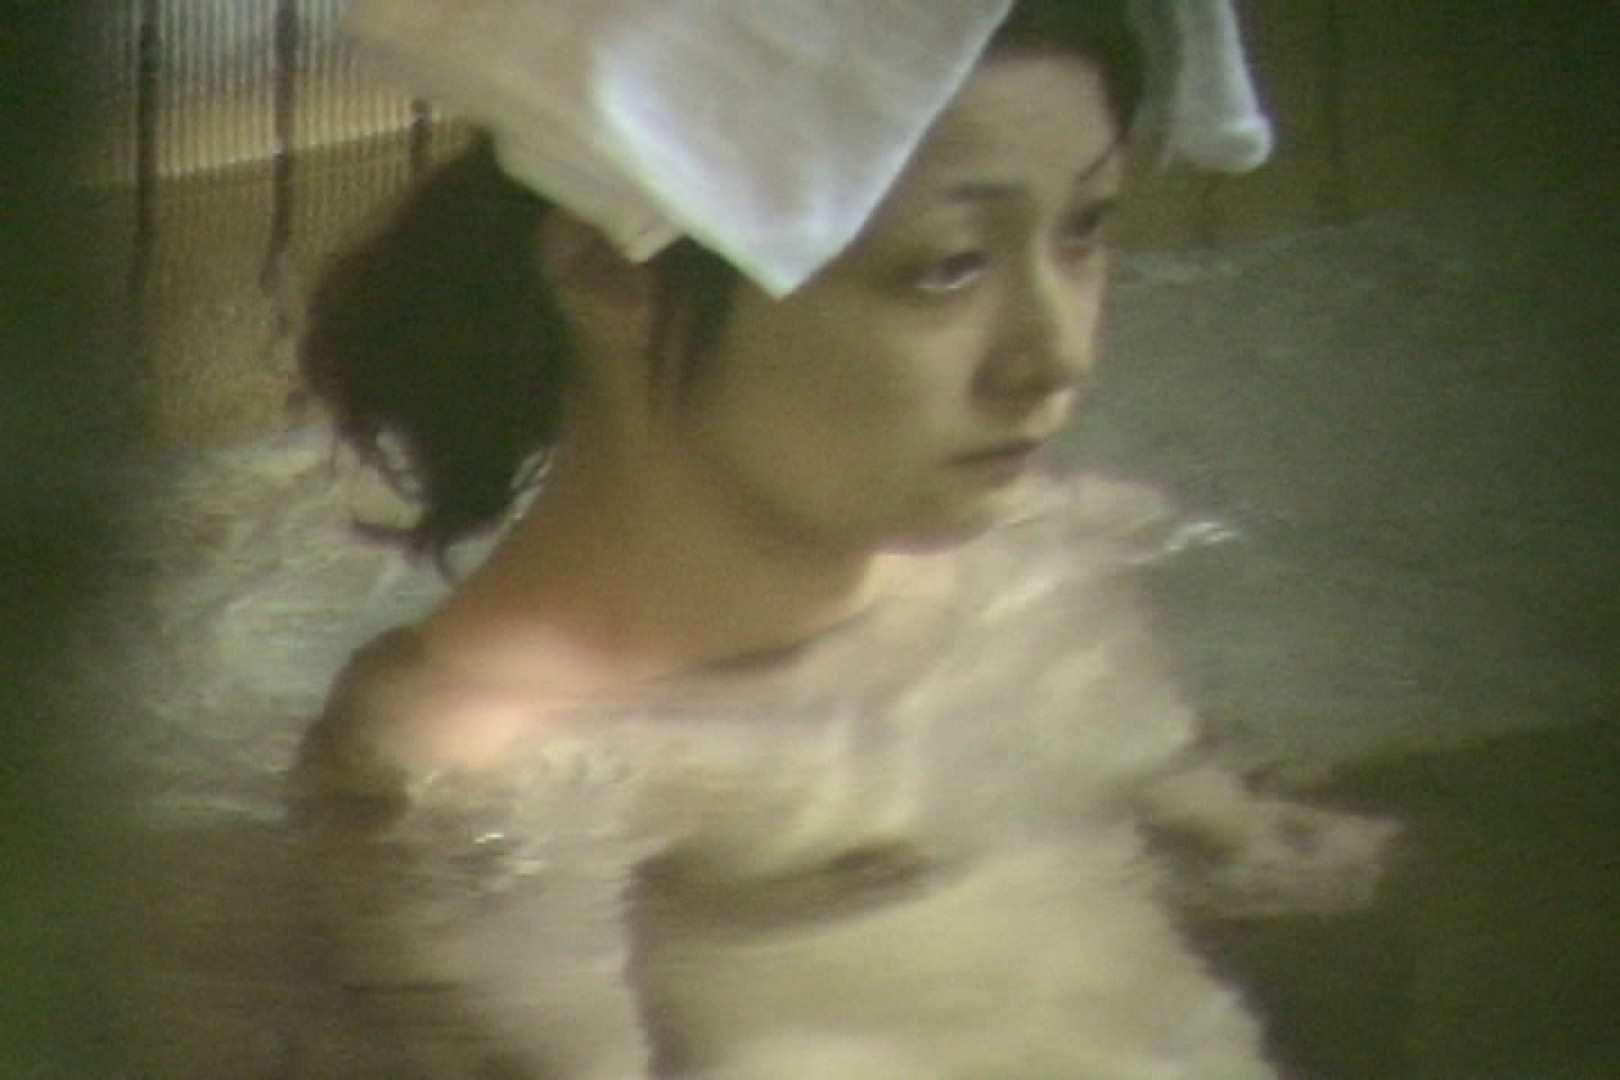 Aquaな露天風呂Vol.701 露天 すけべAV動画紹介 89連発 29